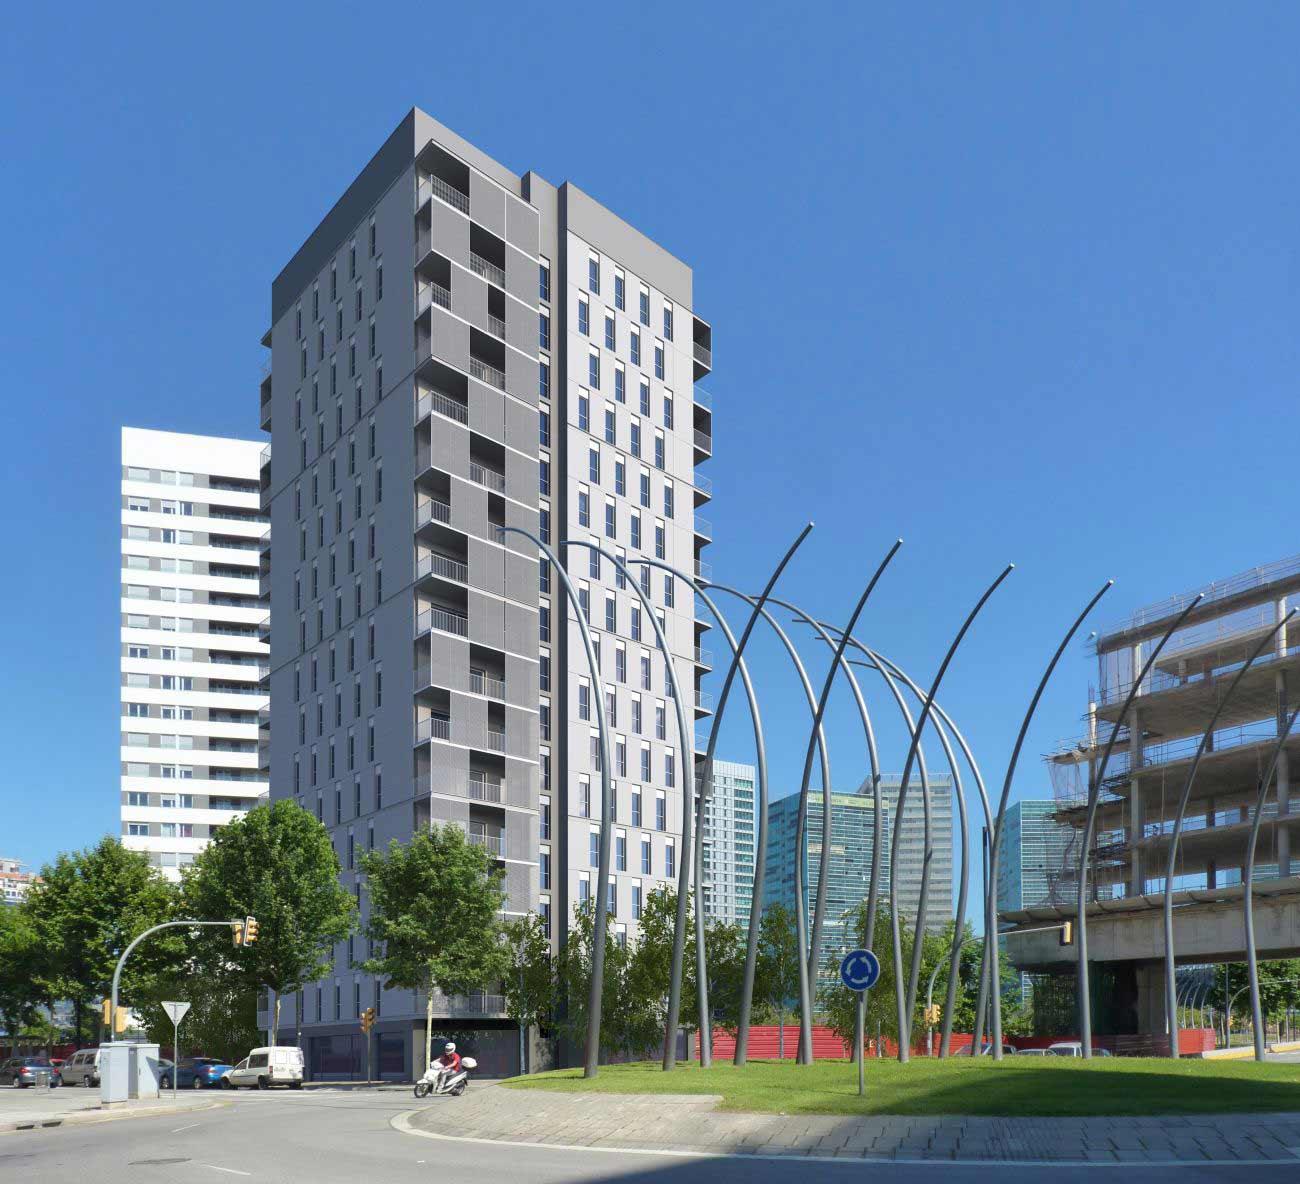 ADEMÀ CANELA COMELLA Arquitectes Associats S.L.P: Torre Neinor